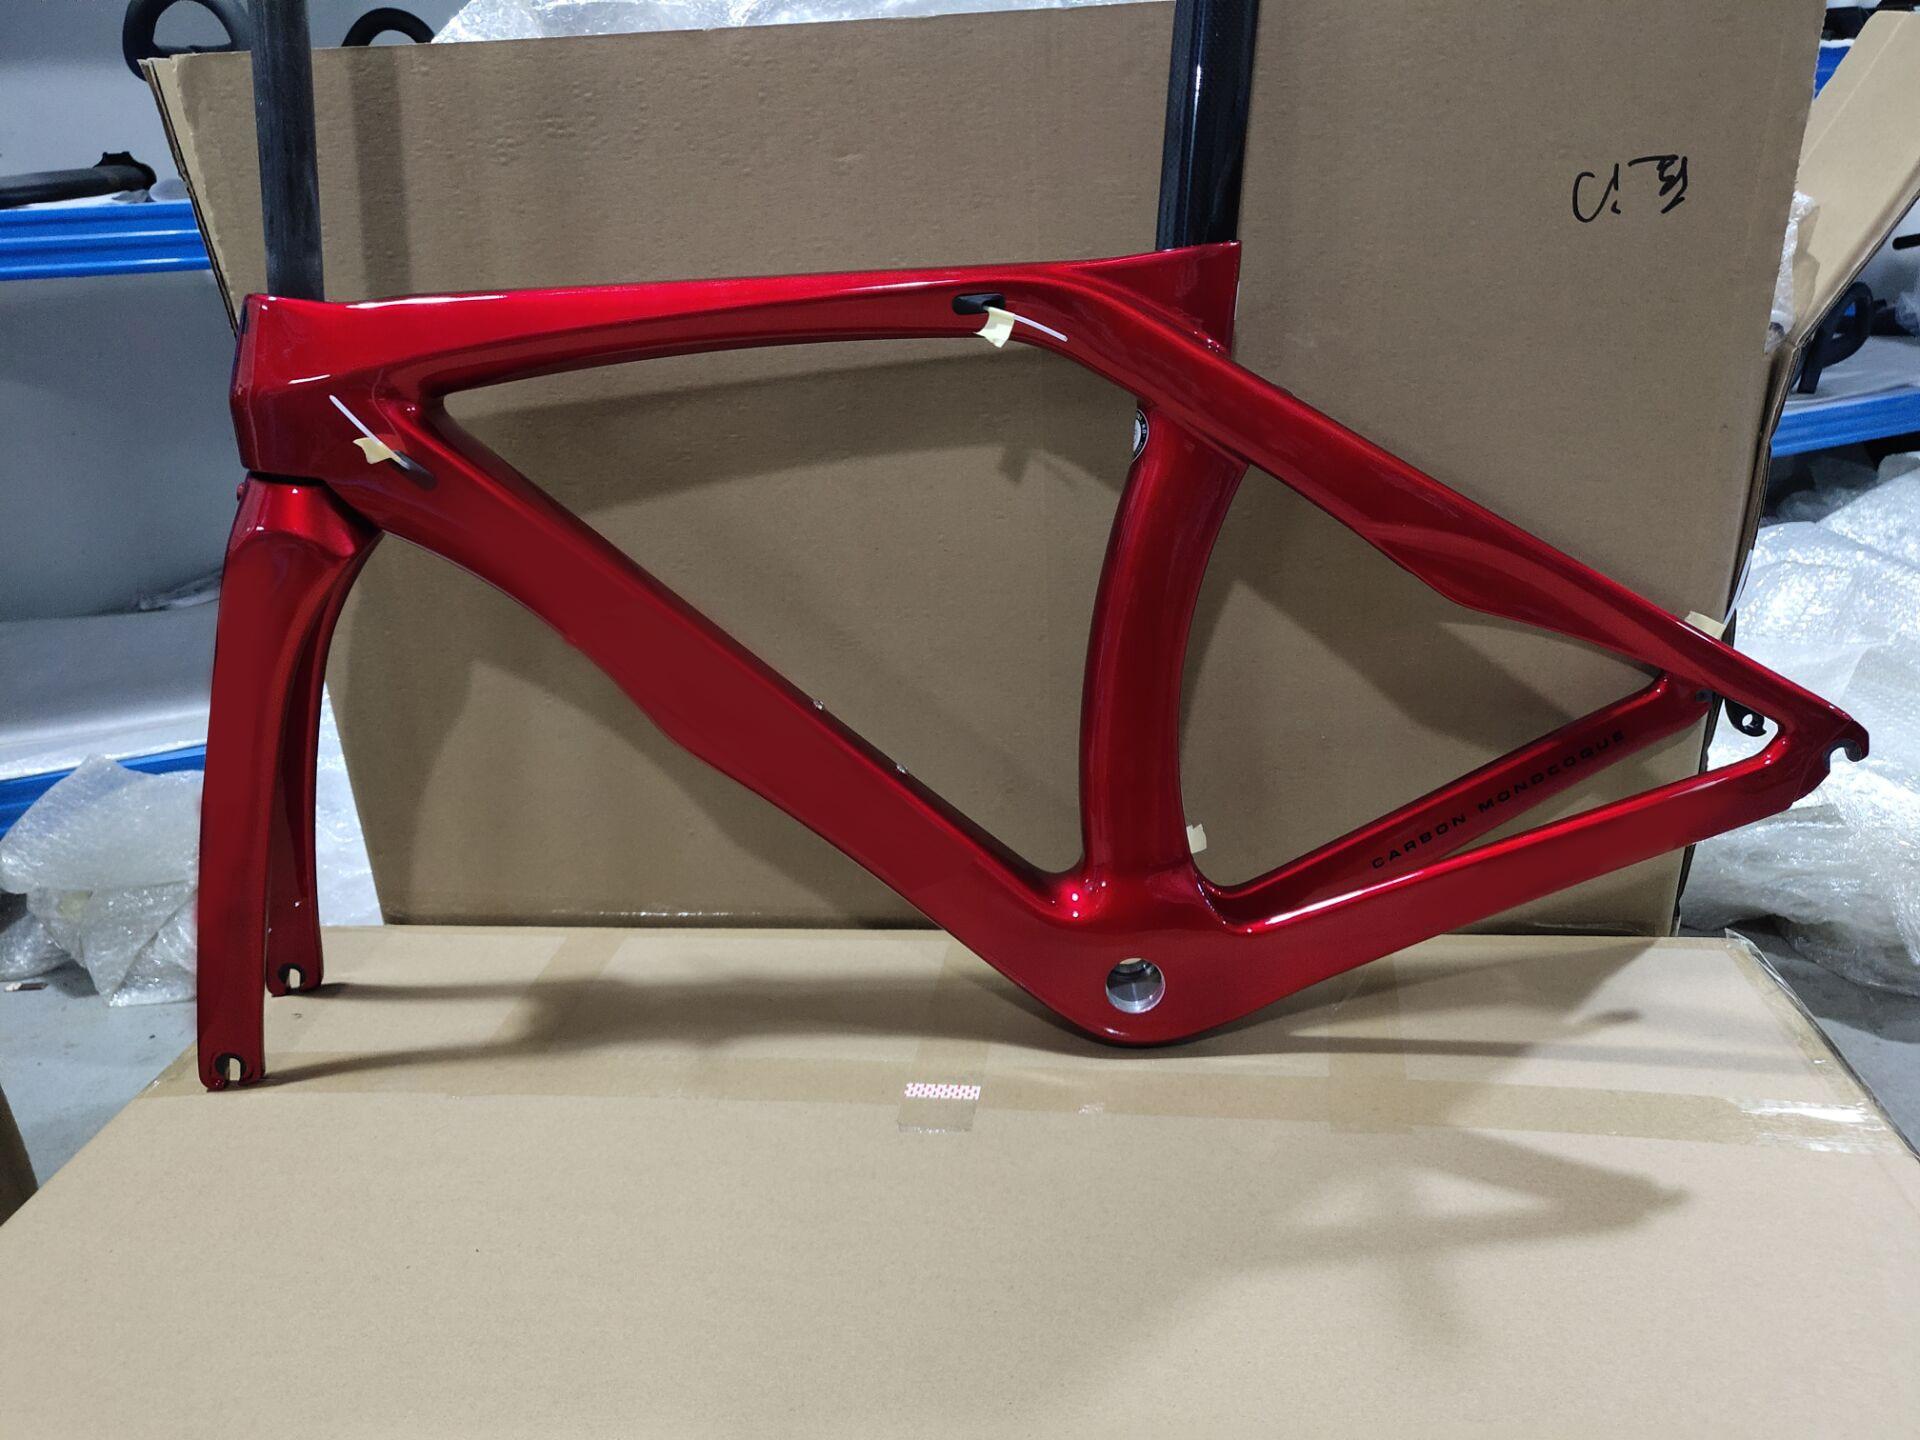 carbon road frame LNRB1K Di2 Mechanical carbon frame 3K1K racing bicycle road bike frameset accept customized